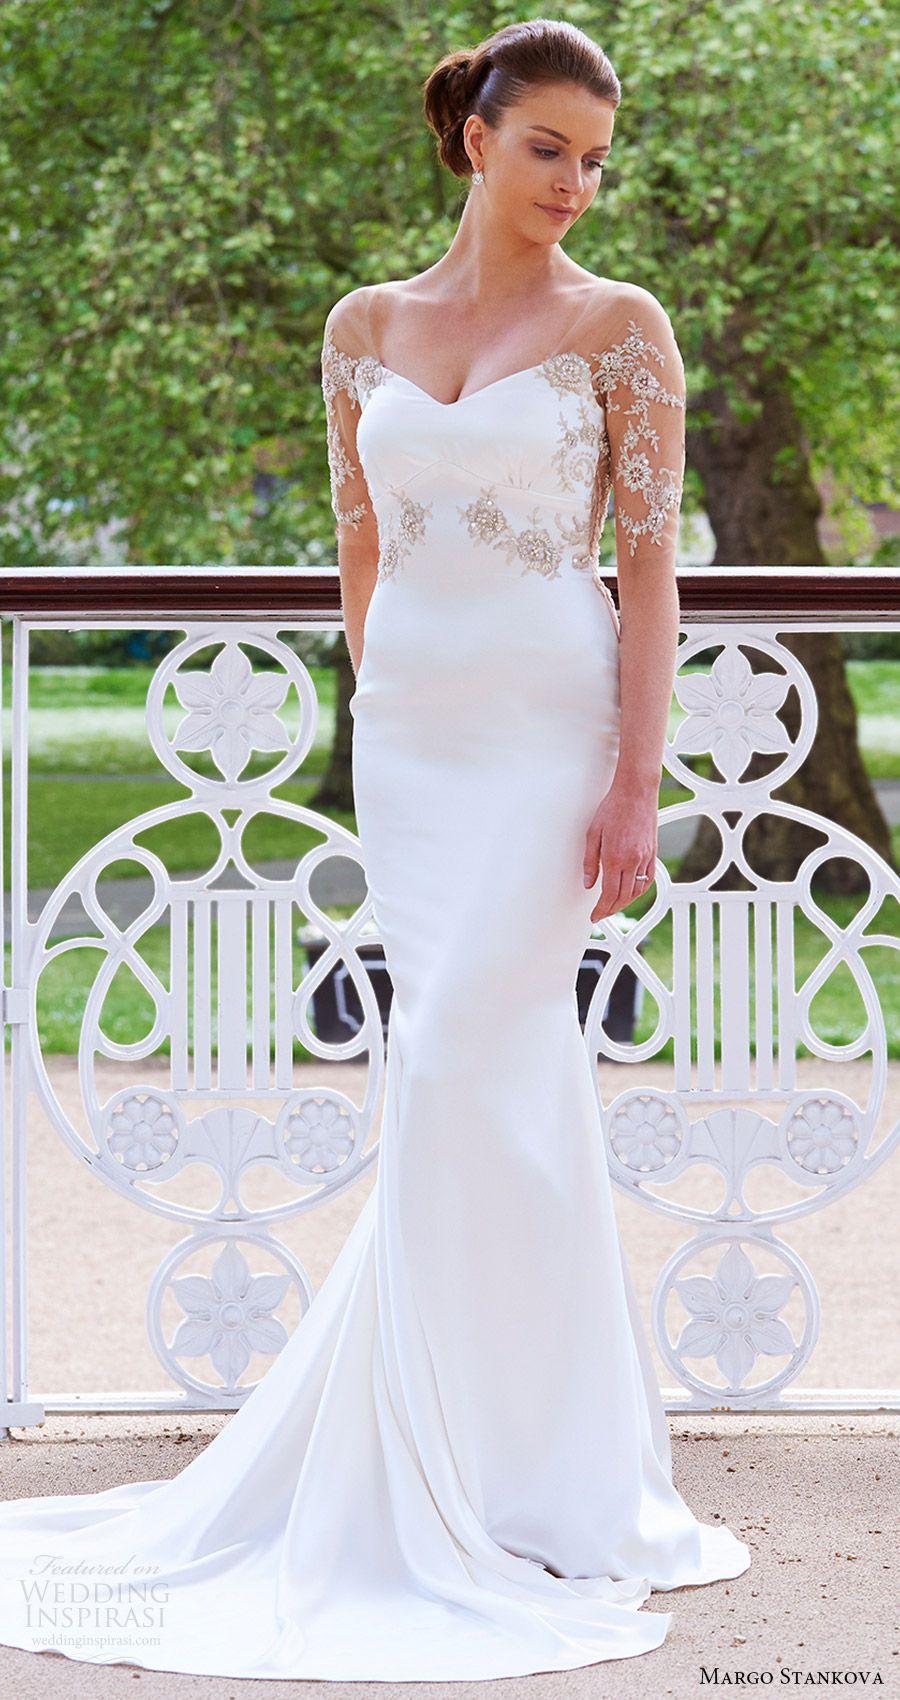 Popular wedding dresses of u part mermaids sheaths and fit